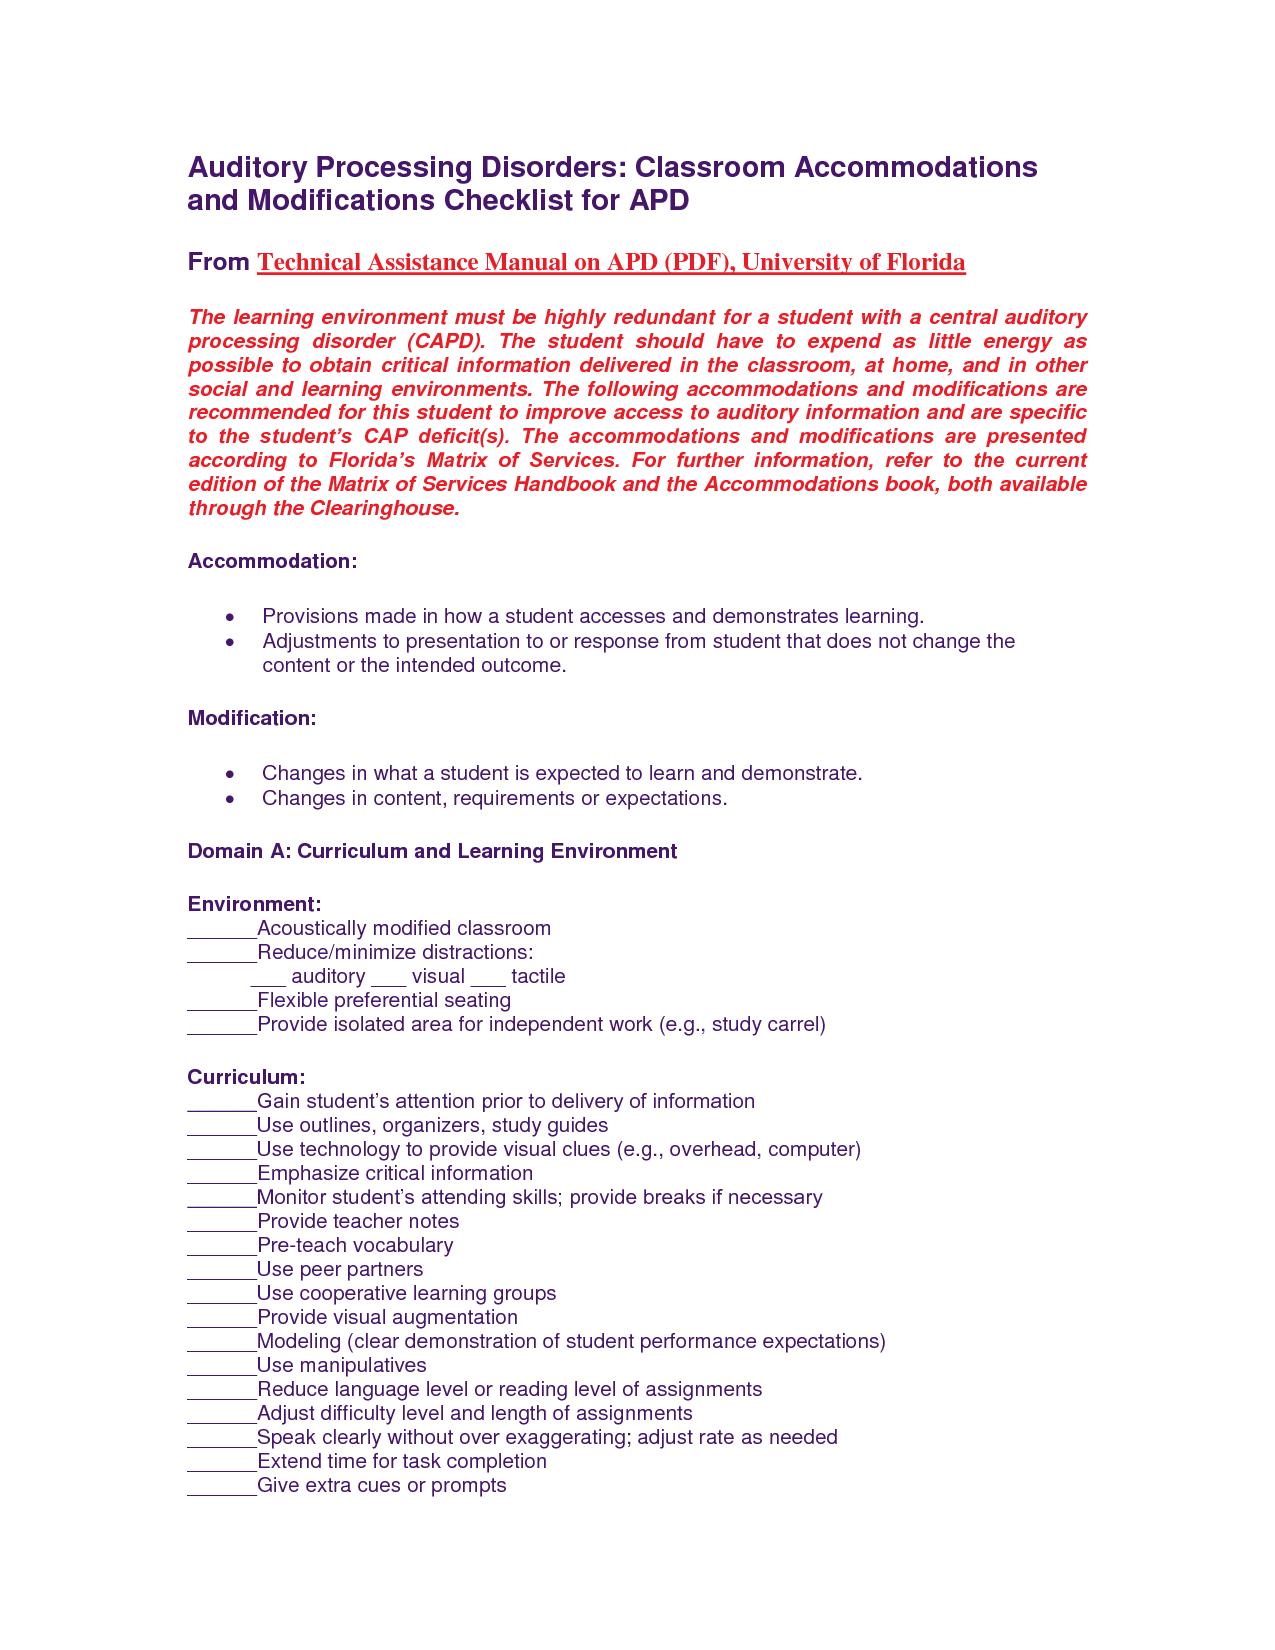 Regulae Form Checklist Apd